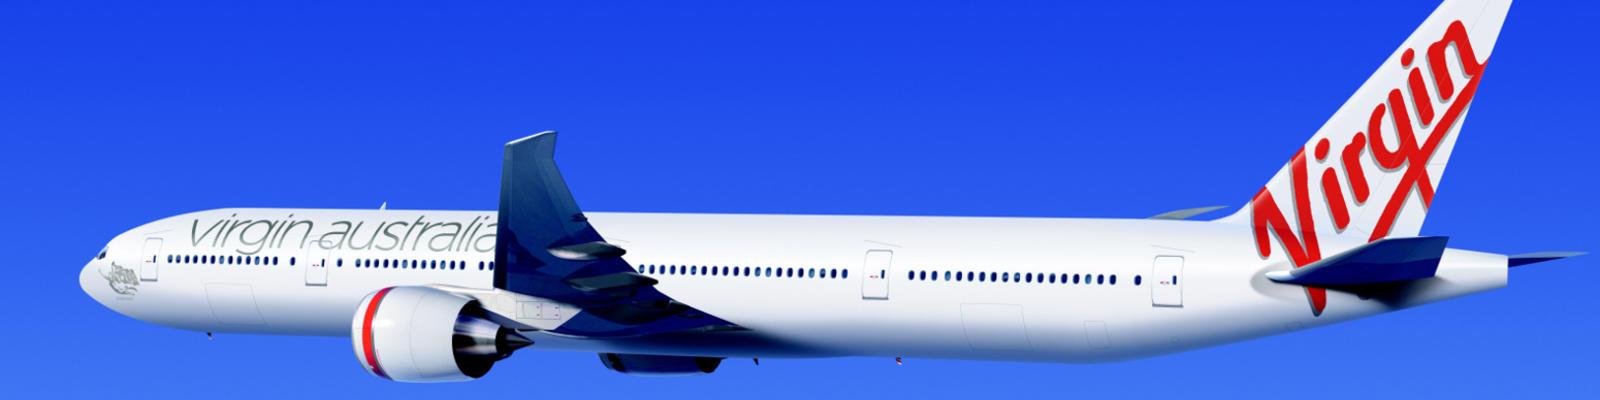 A Virgin Australia airplane flying through blue skies